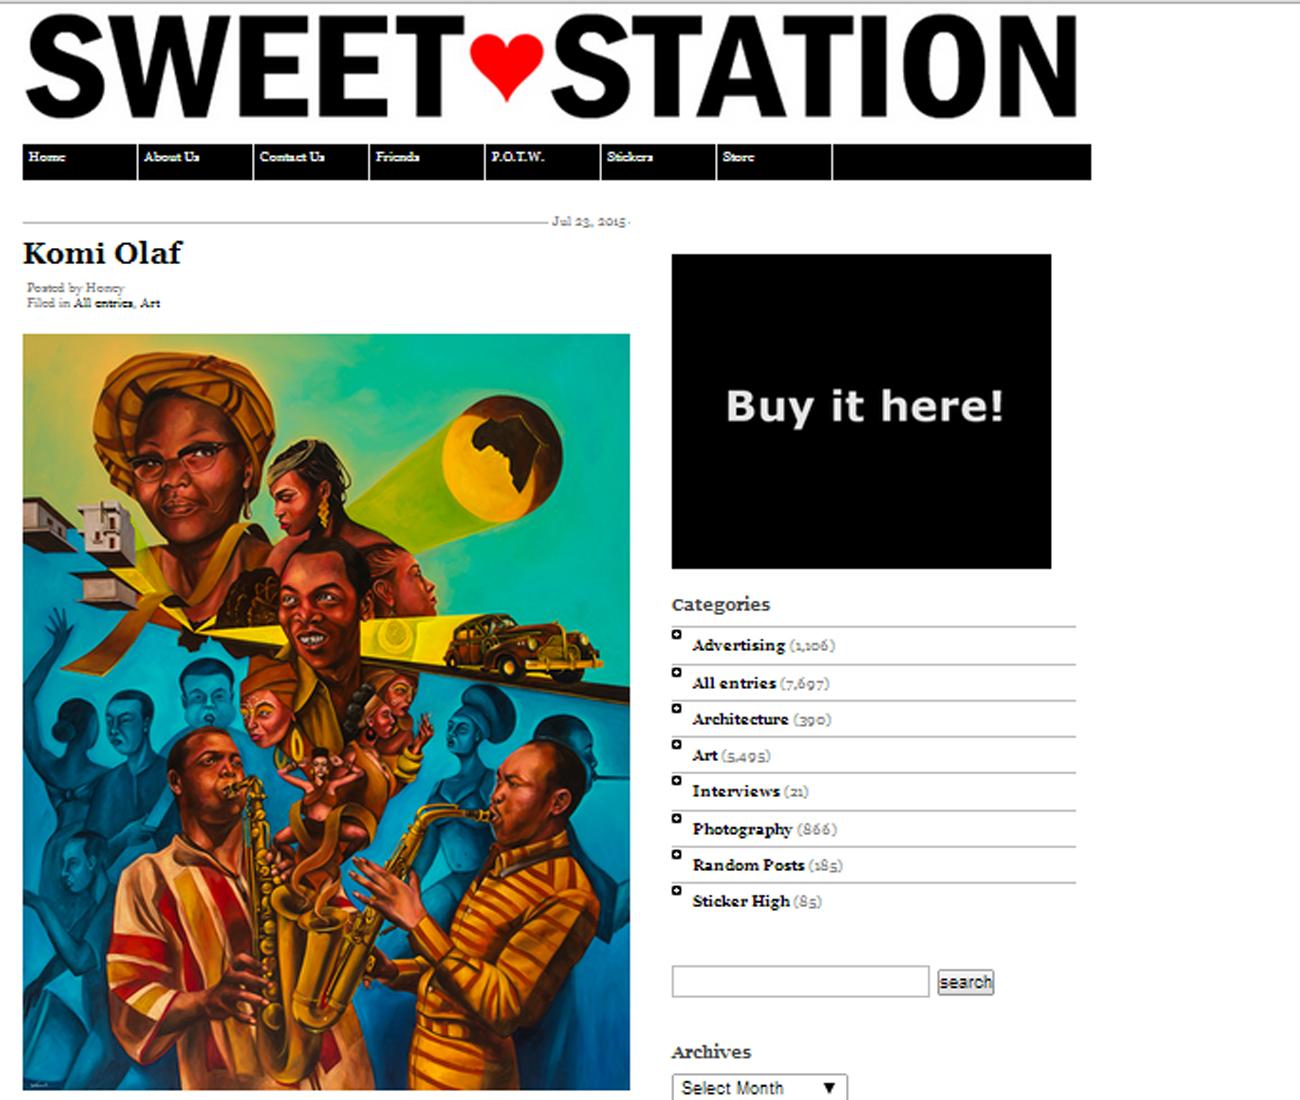 http://sweet-station.com/blog/2015/07/komi-olaf/